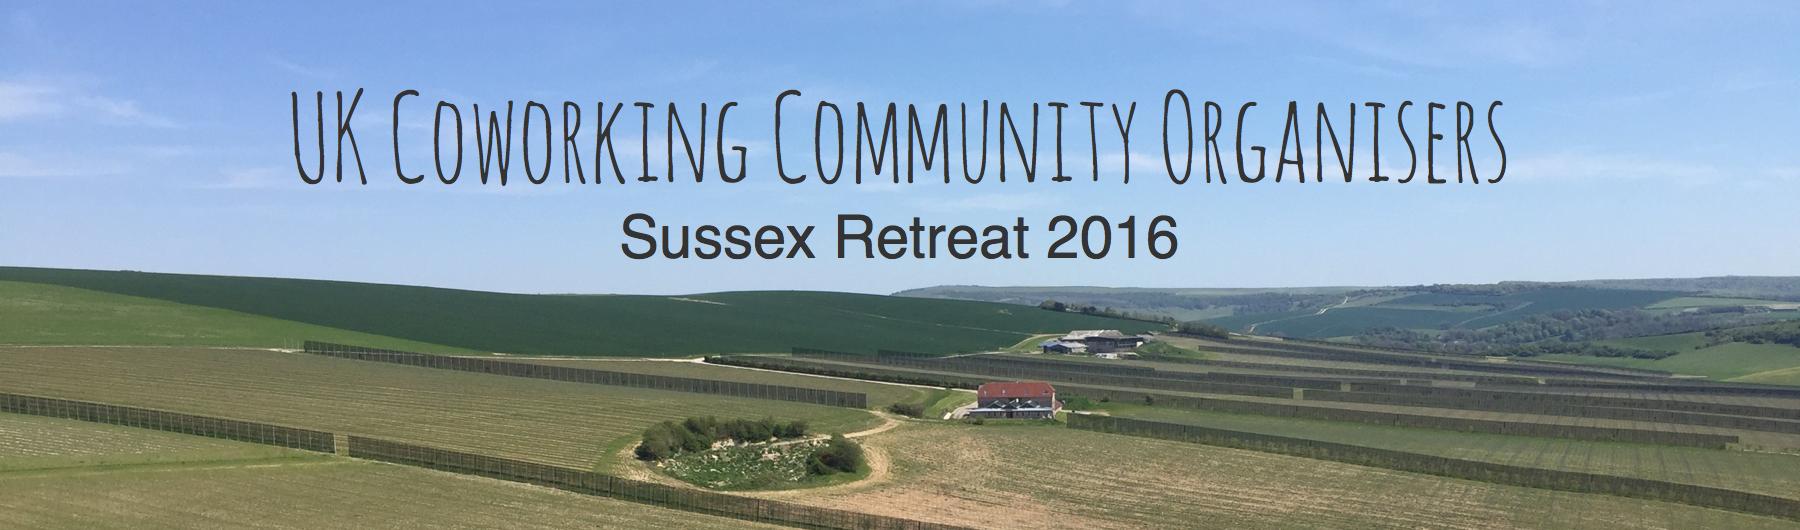 Sussex Coworking Retreat 2016